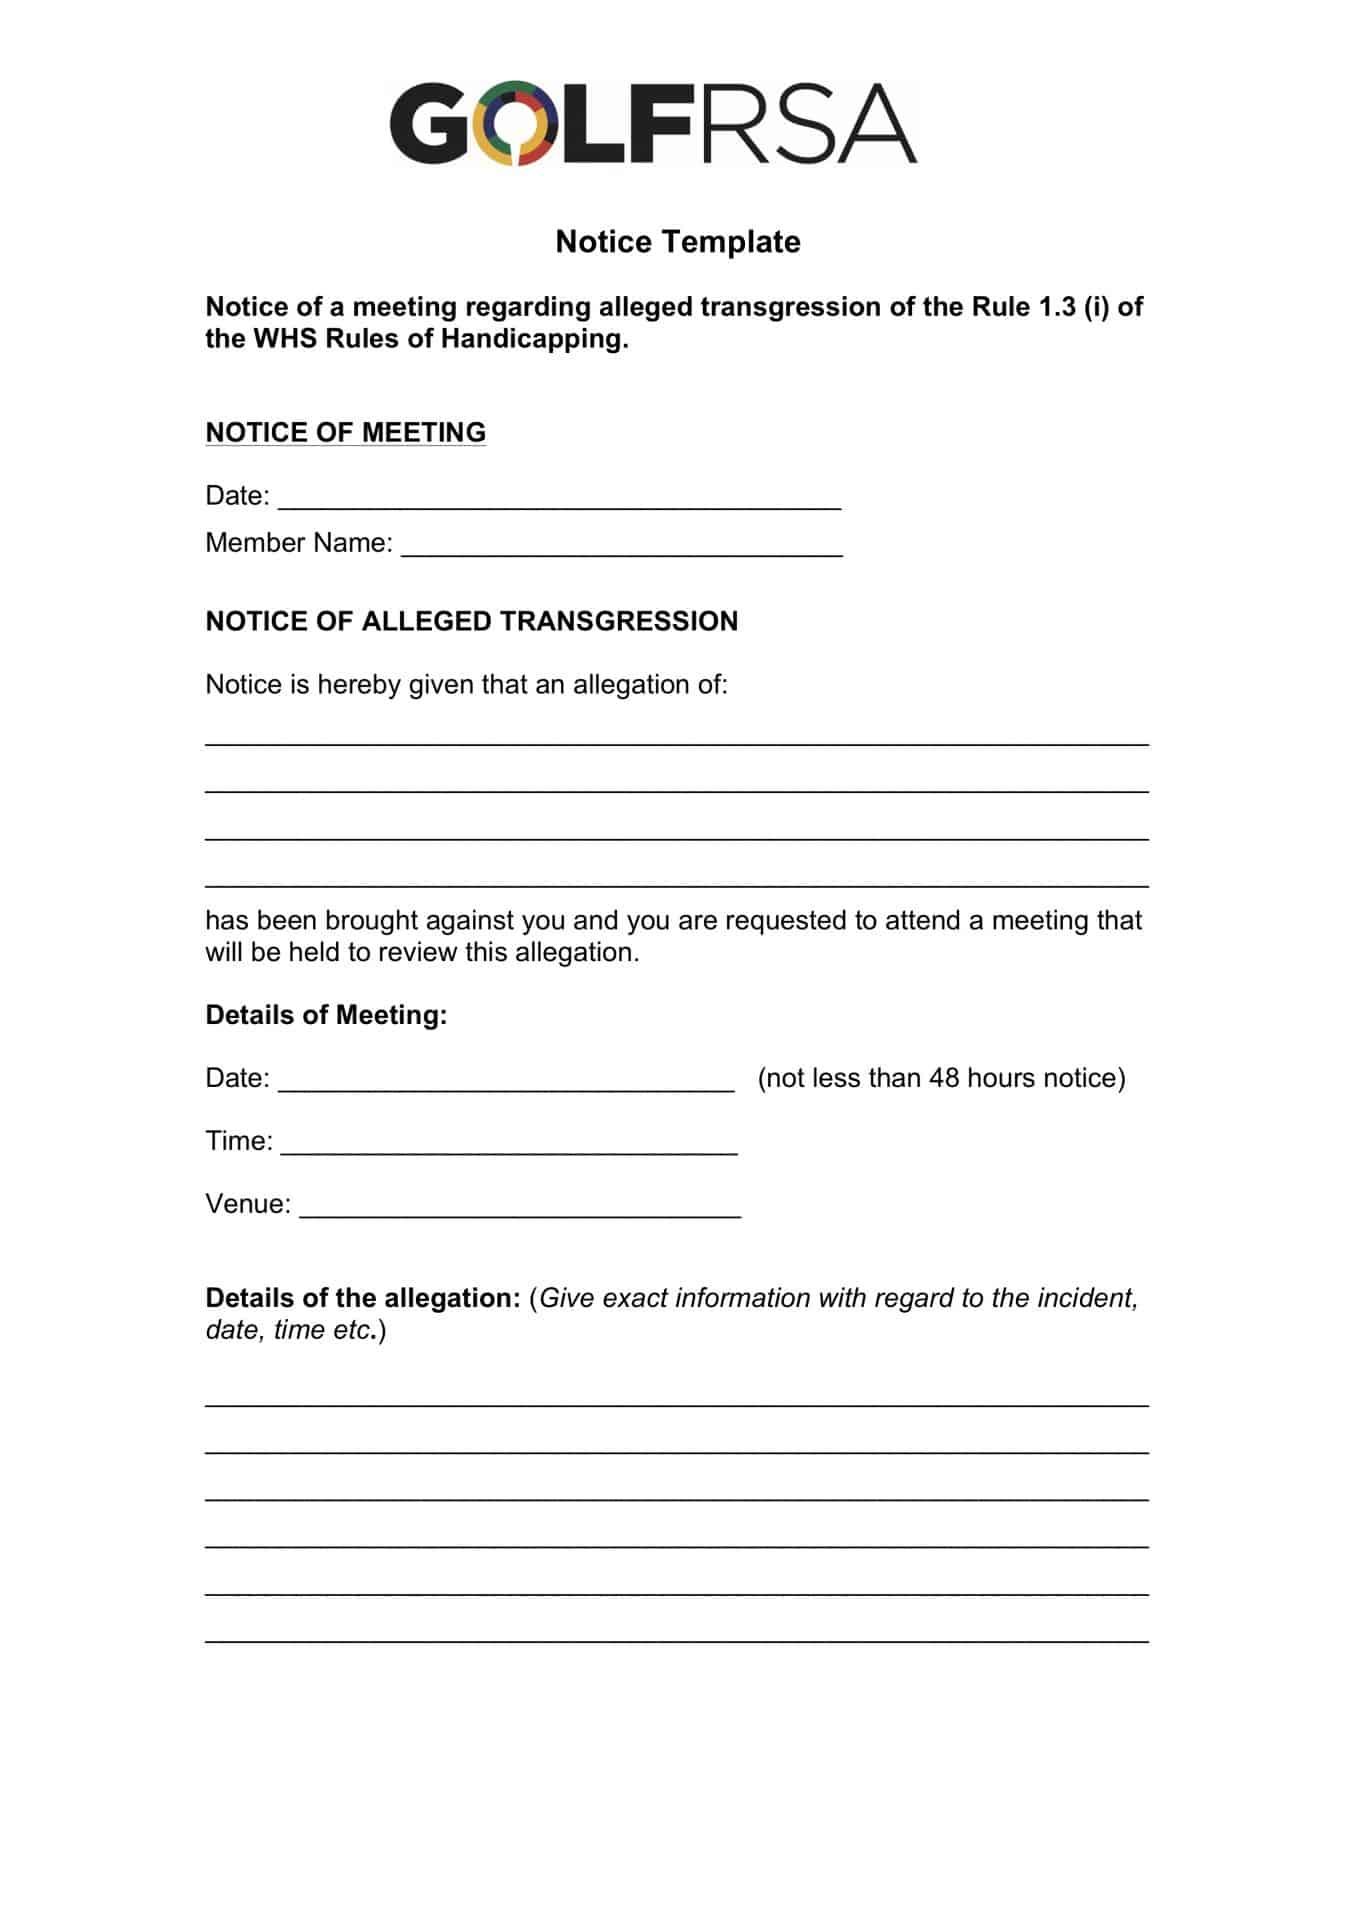 GolfRSA Notice of meeting template 1